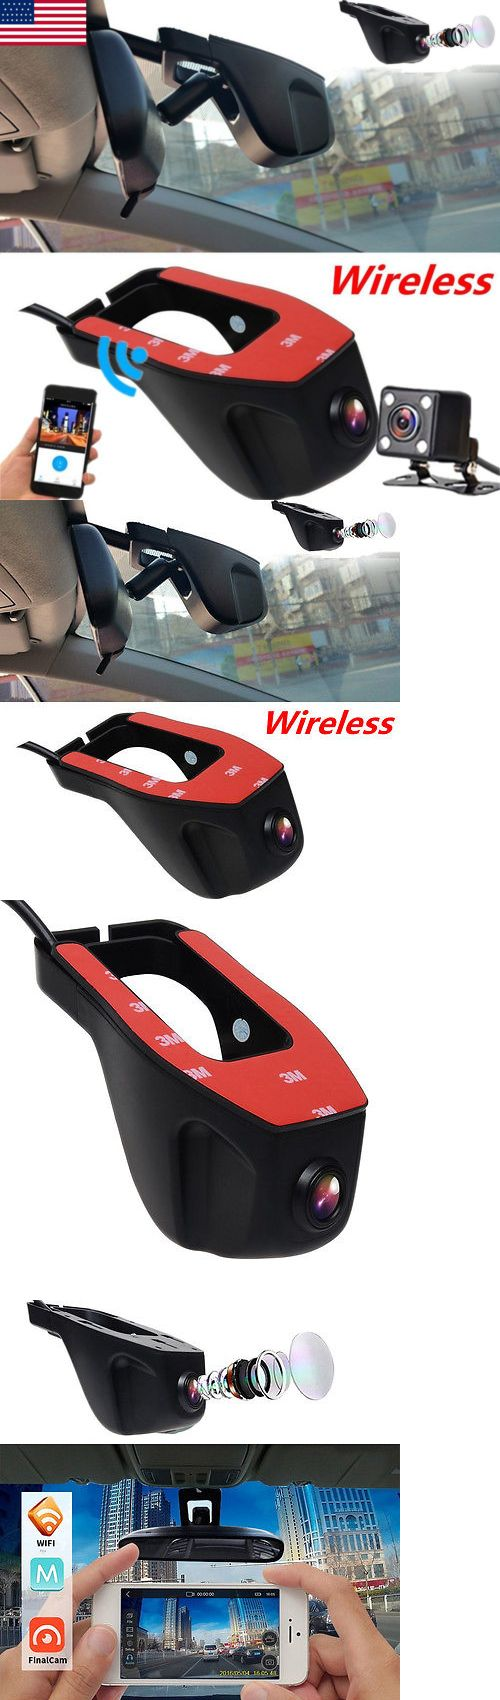 Digital Video Recorders Cards: 1080P Hd Hidden Wifi Car Dvr Camera Dash Video Recorder G-Sensor Night Vision Us -> BUY IT NOW ONLY: $49.99 on eBay!